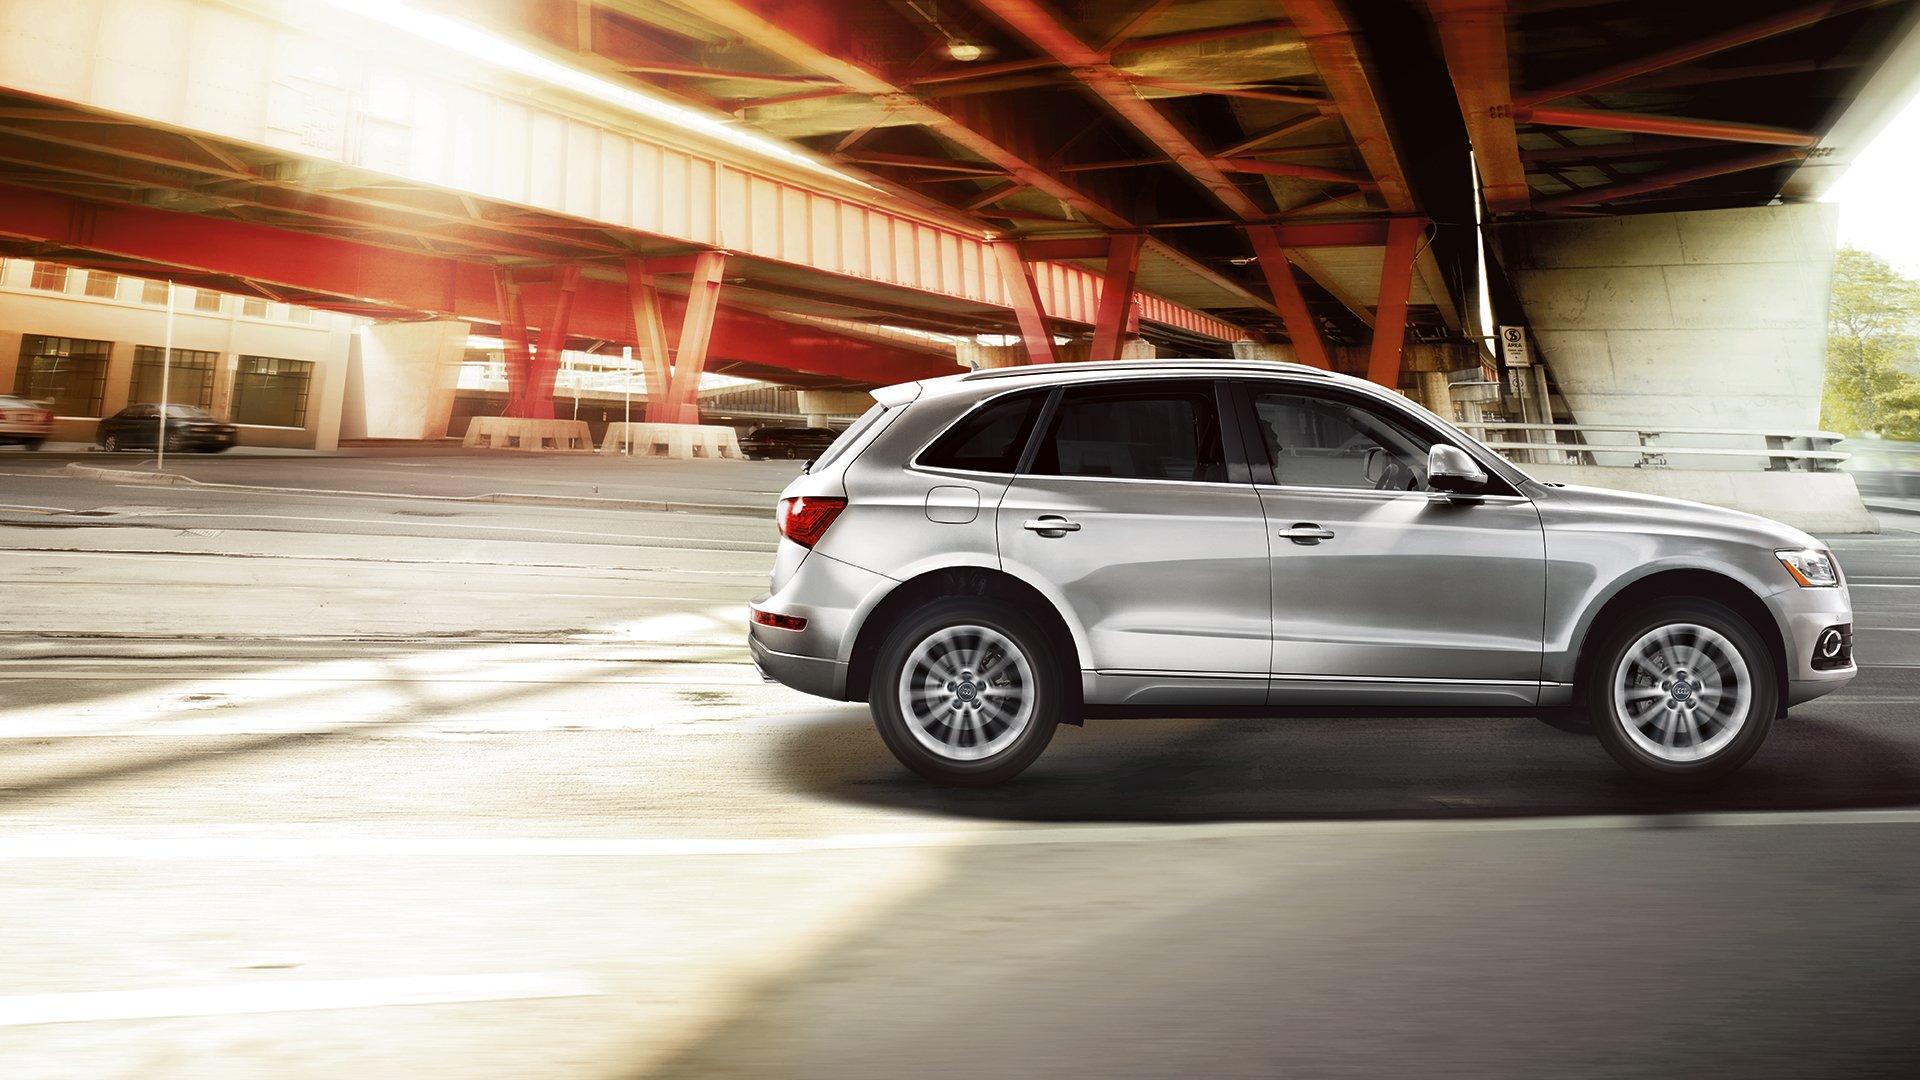 2017 Audi Q5 © Volkswagen AG